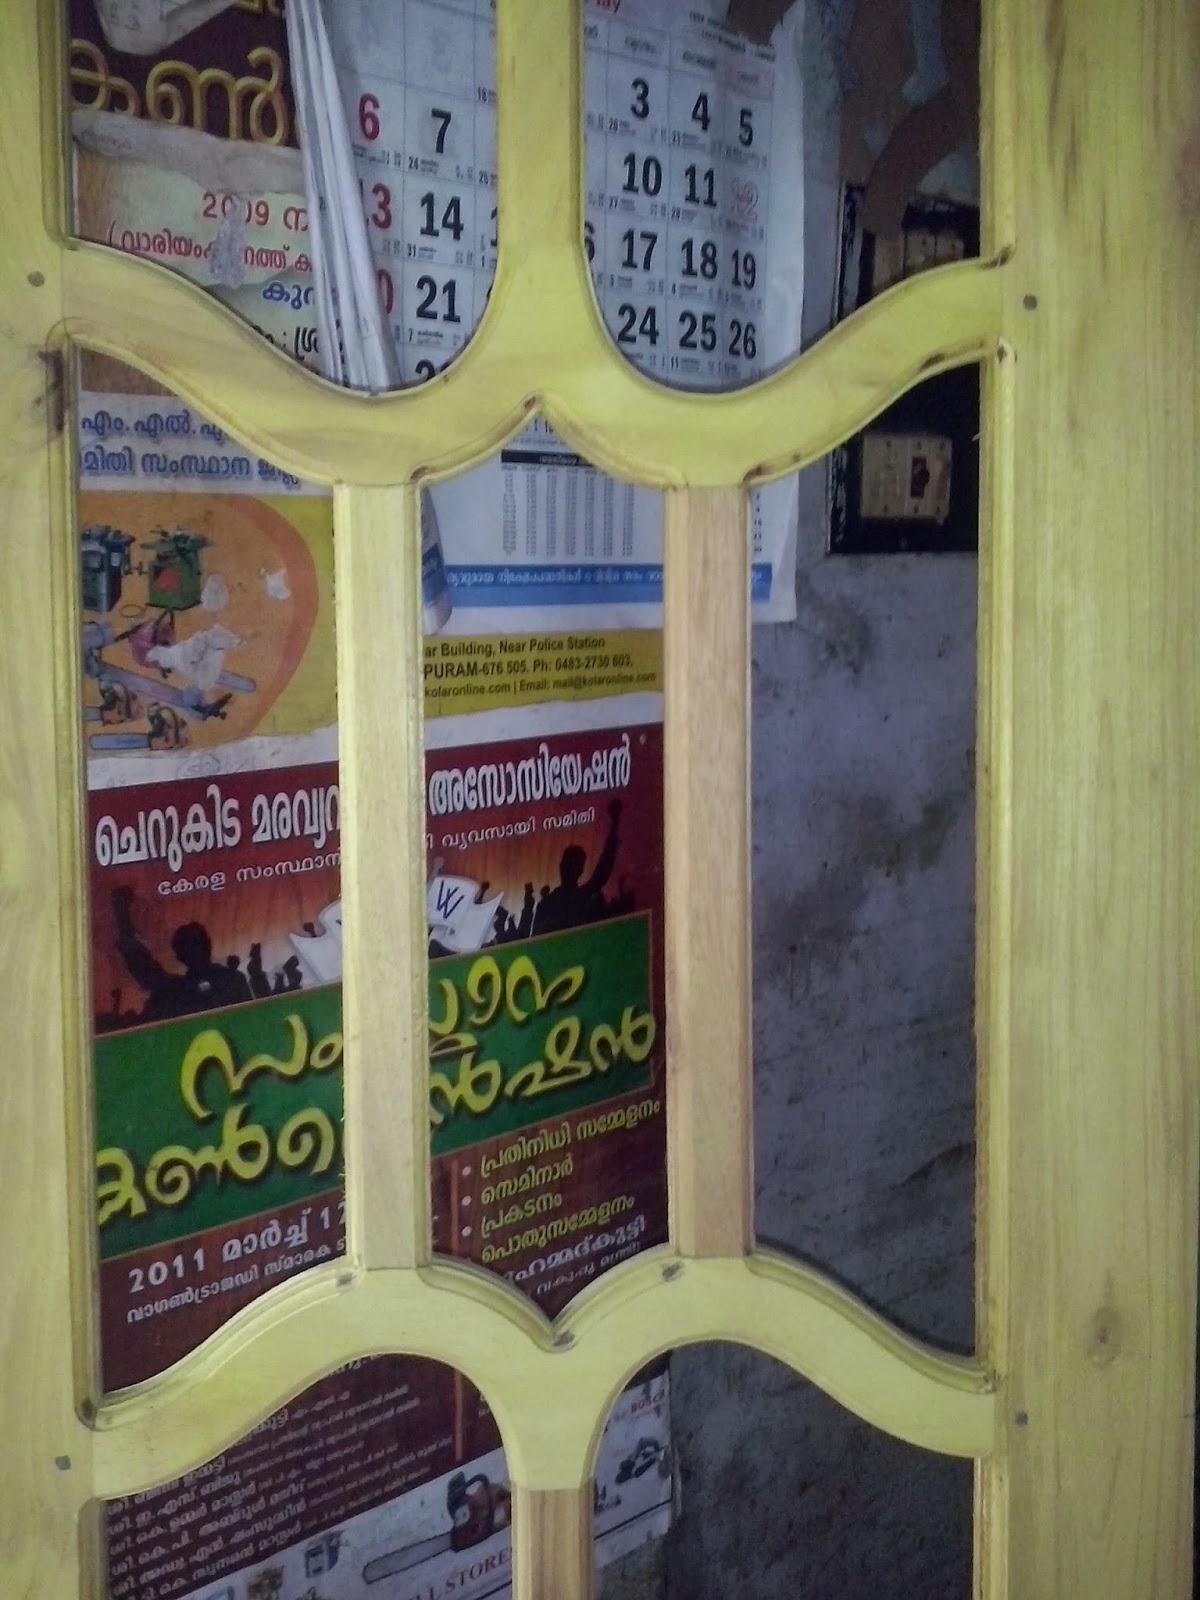 Kerala Style Carpenter Works And Designs September 2013: BAVAS WOOD WORKS: Window Door Design Pictures